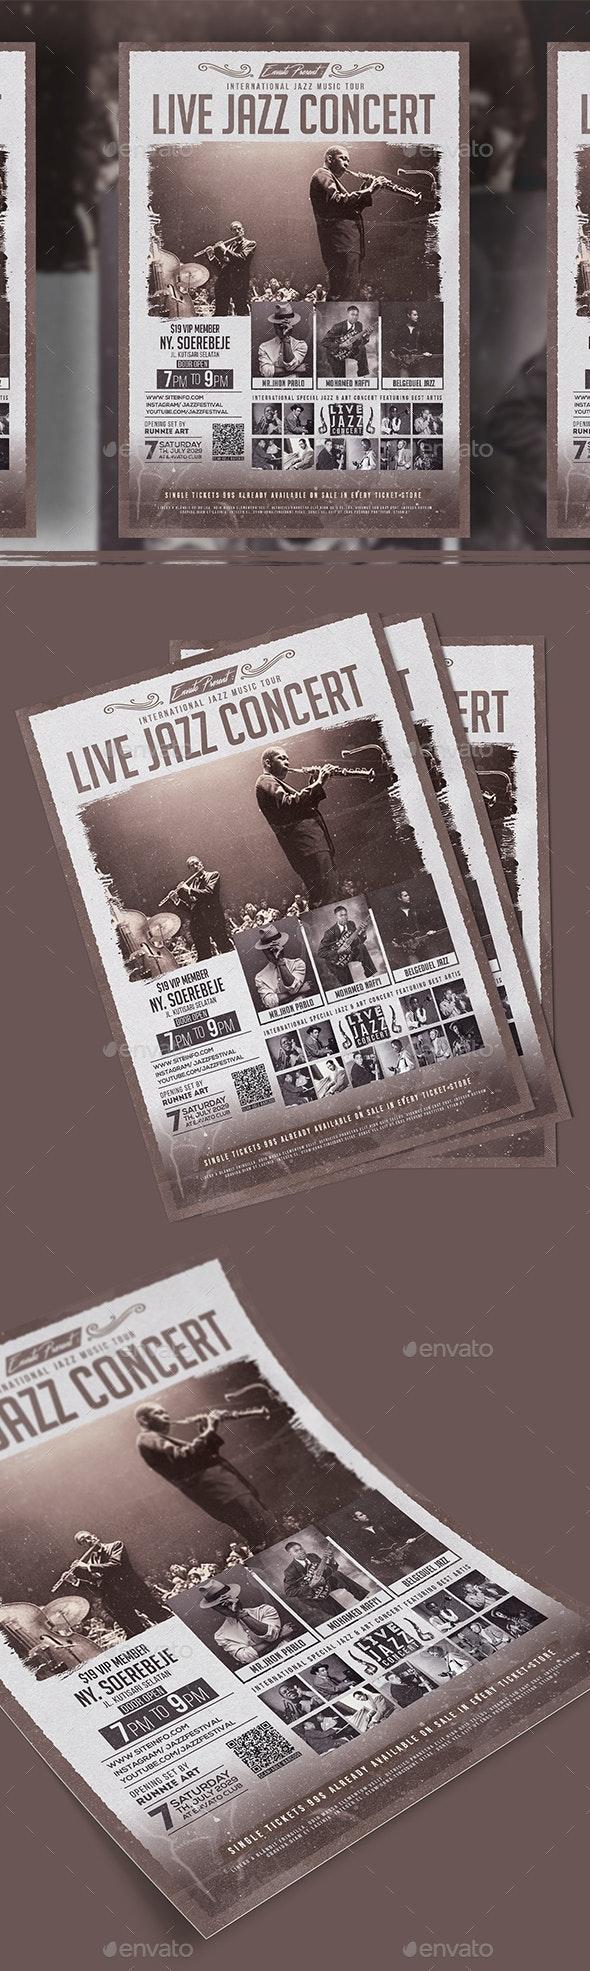 Live Jazz Concert Flyer - Concerts Events